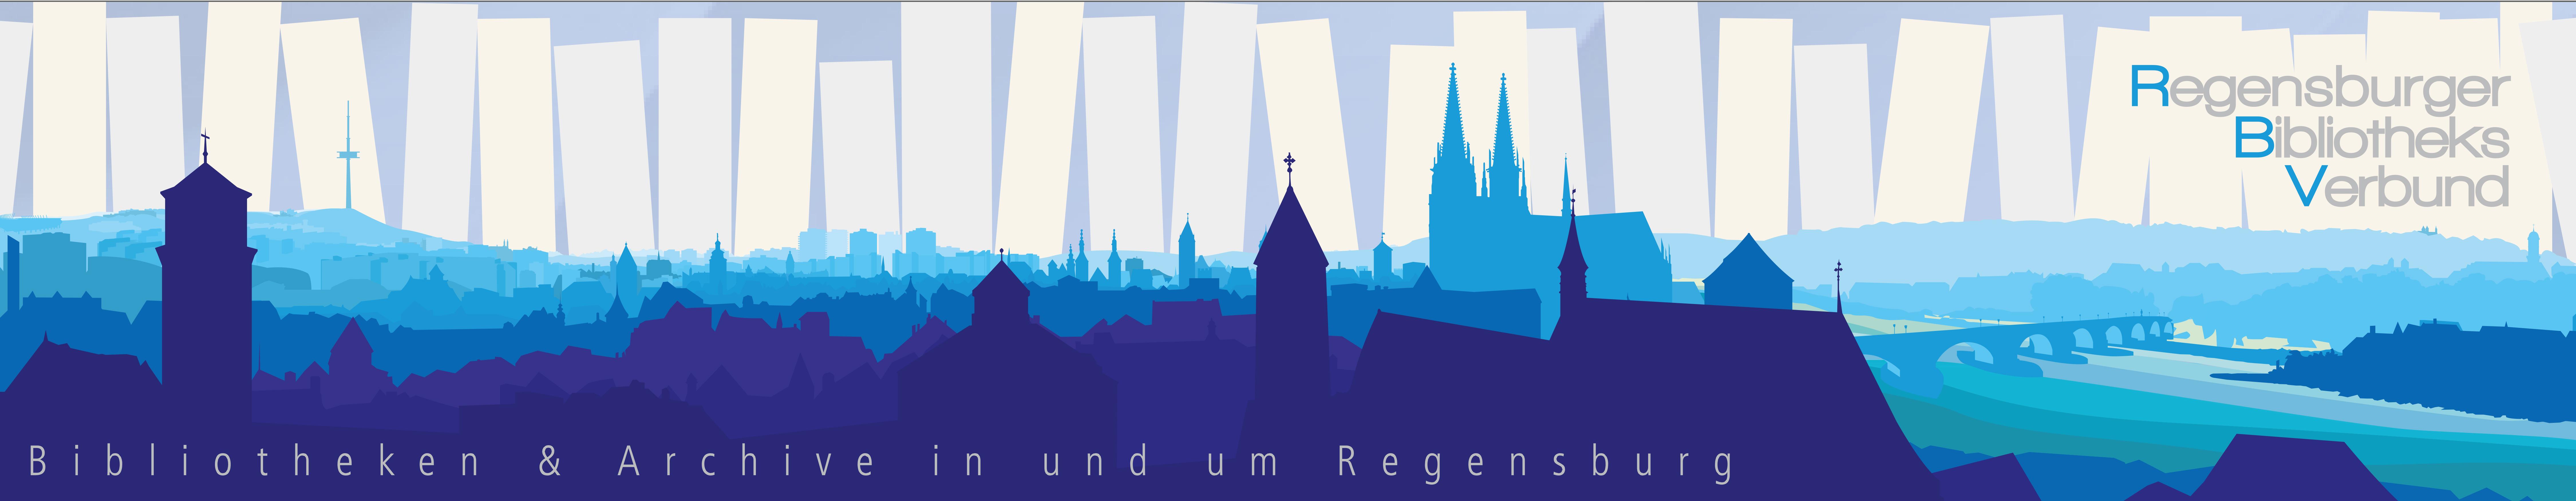 Regensburger Bibliotheksverbund